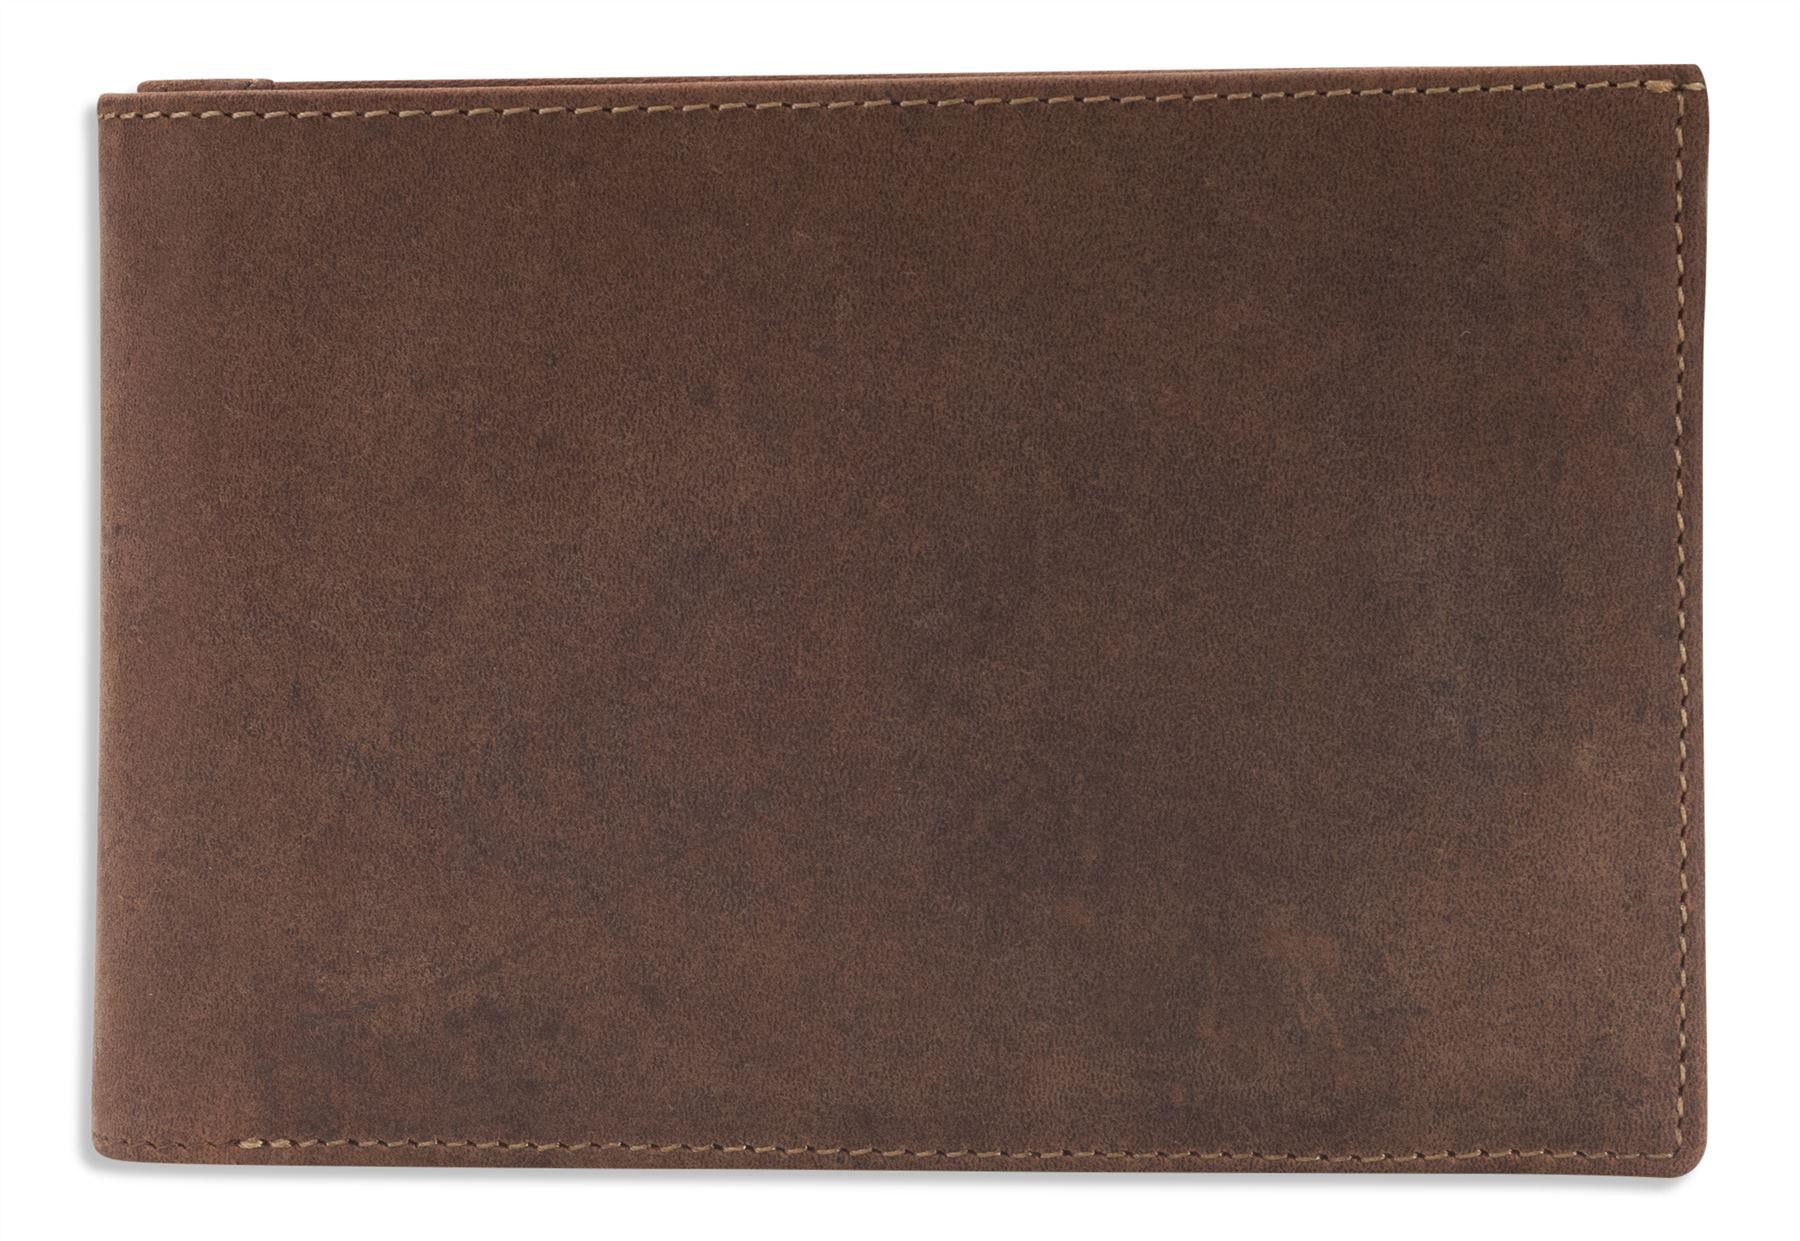 Visconti-Mens-Real-Leather-Travel-RFID-Wallet-Passport-Holder-Genuine-JET-VS-726